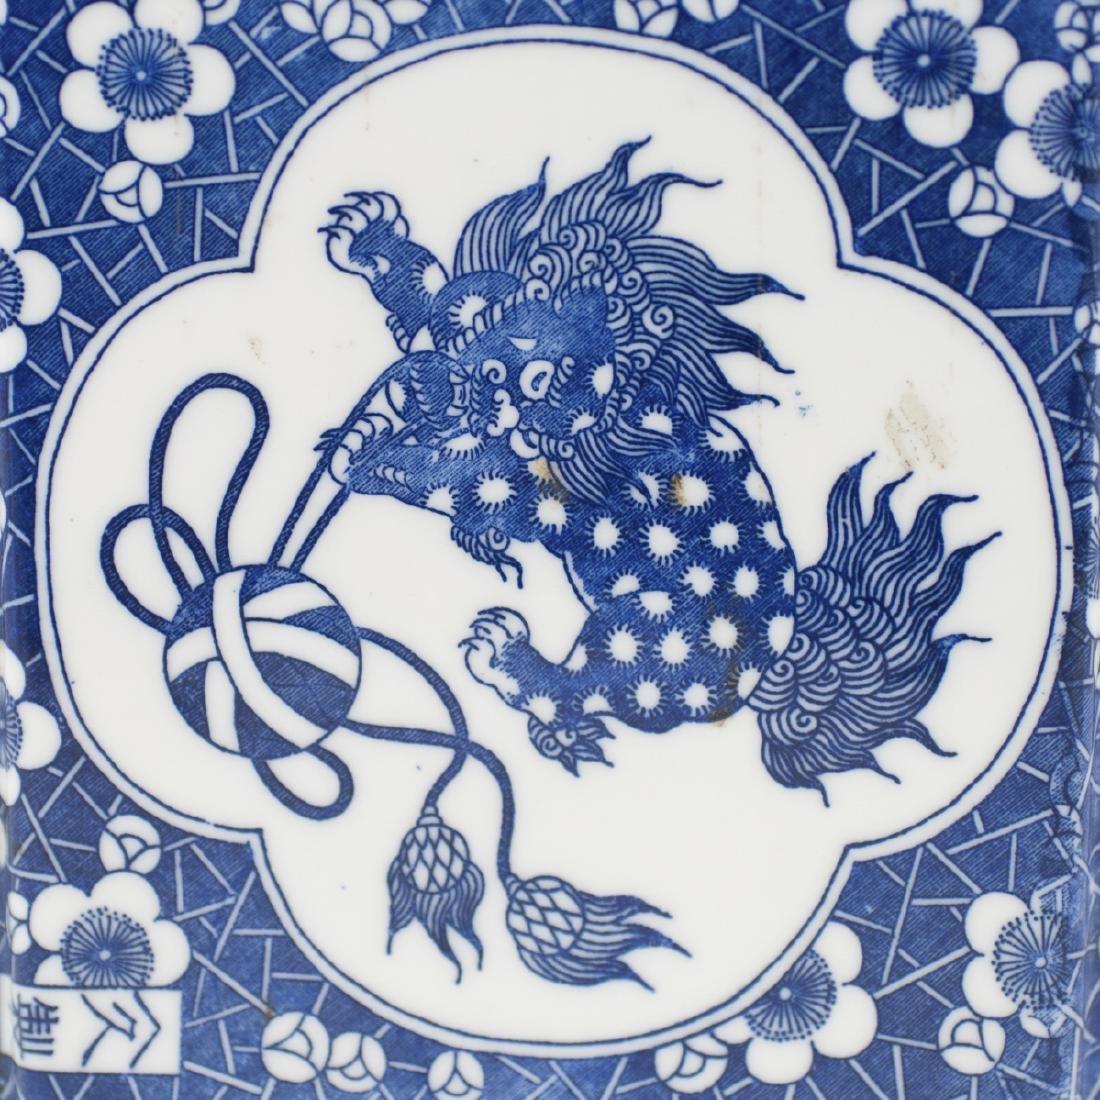 Chinese Porcelain Blue & White Bough Pot - 2